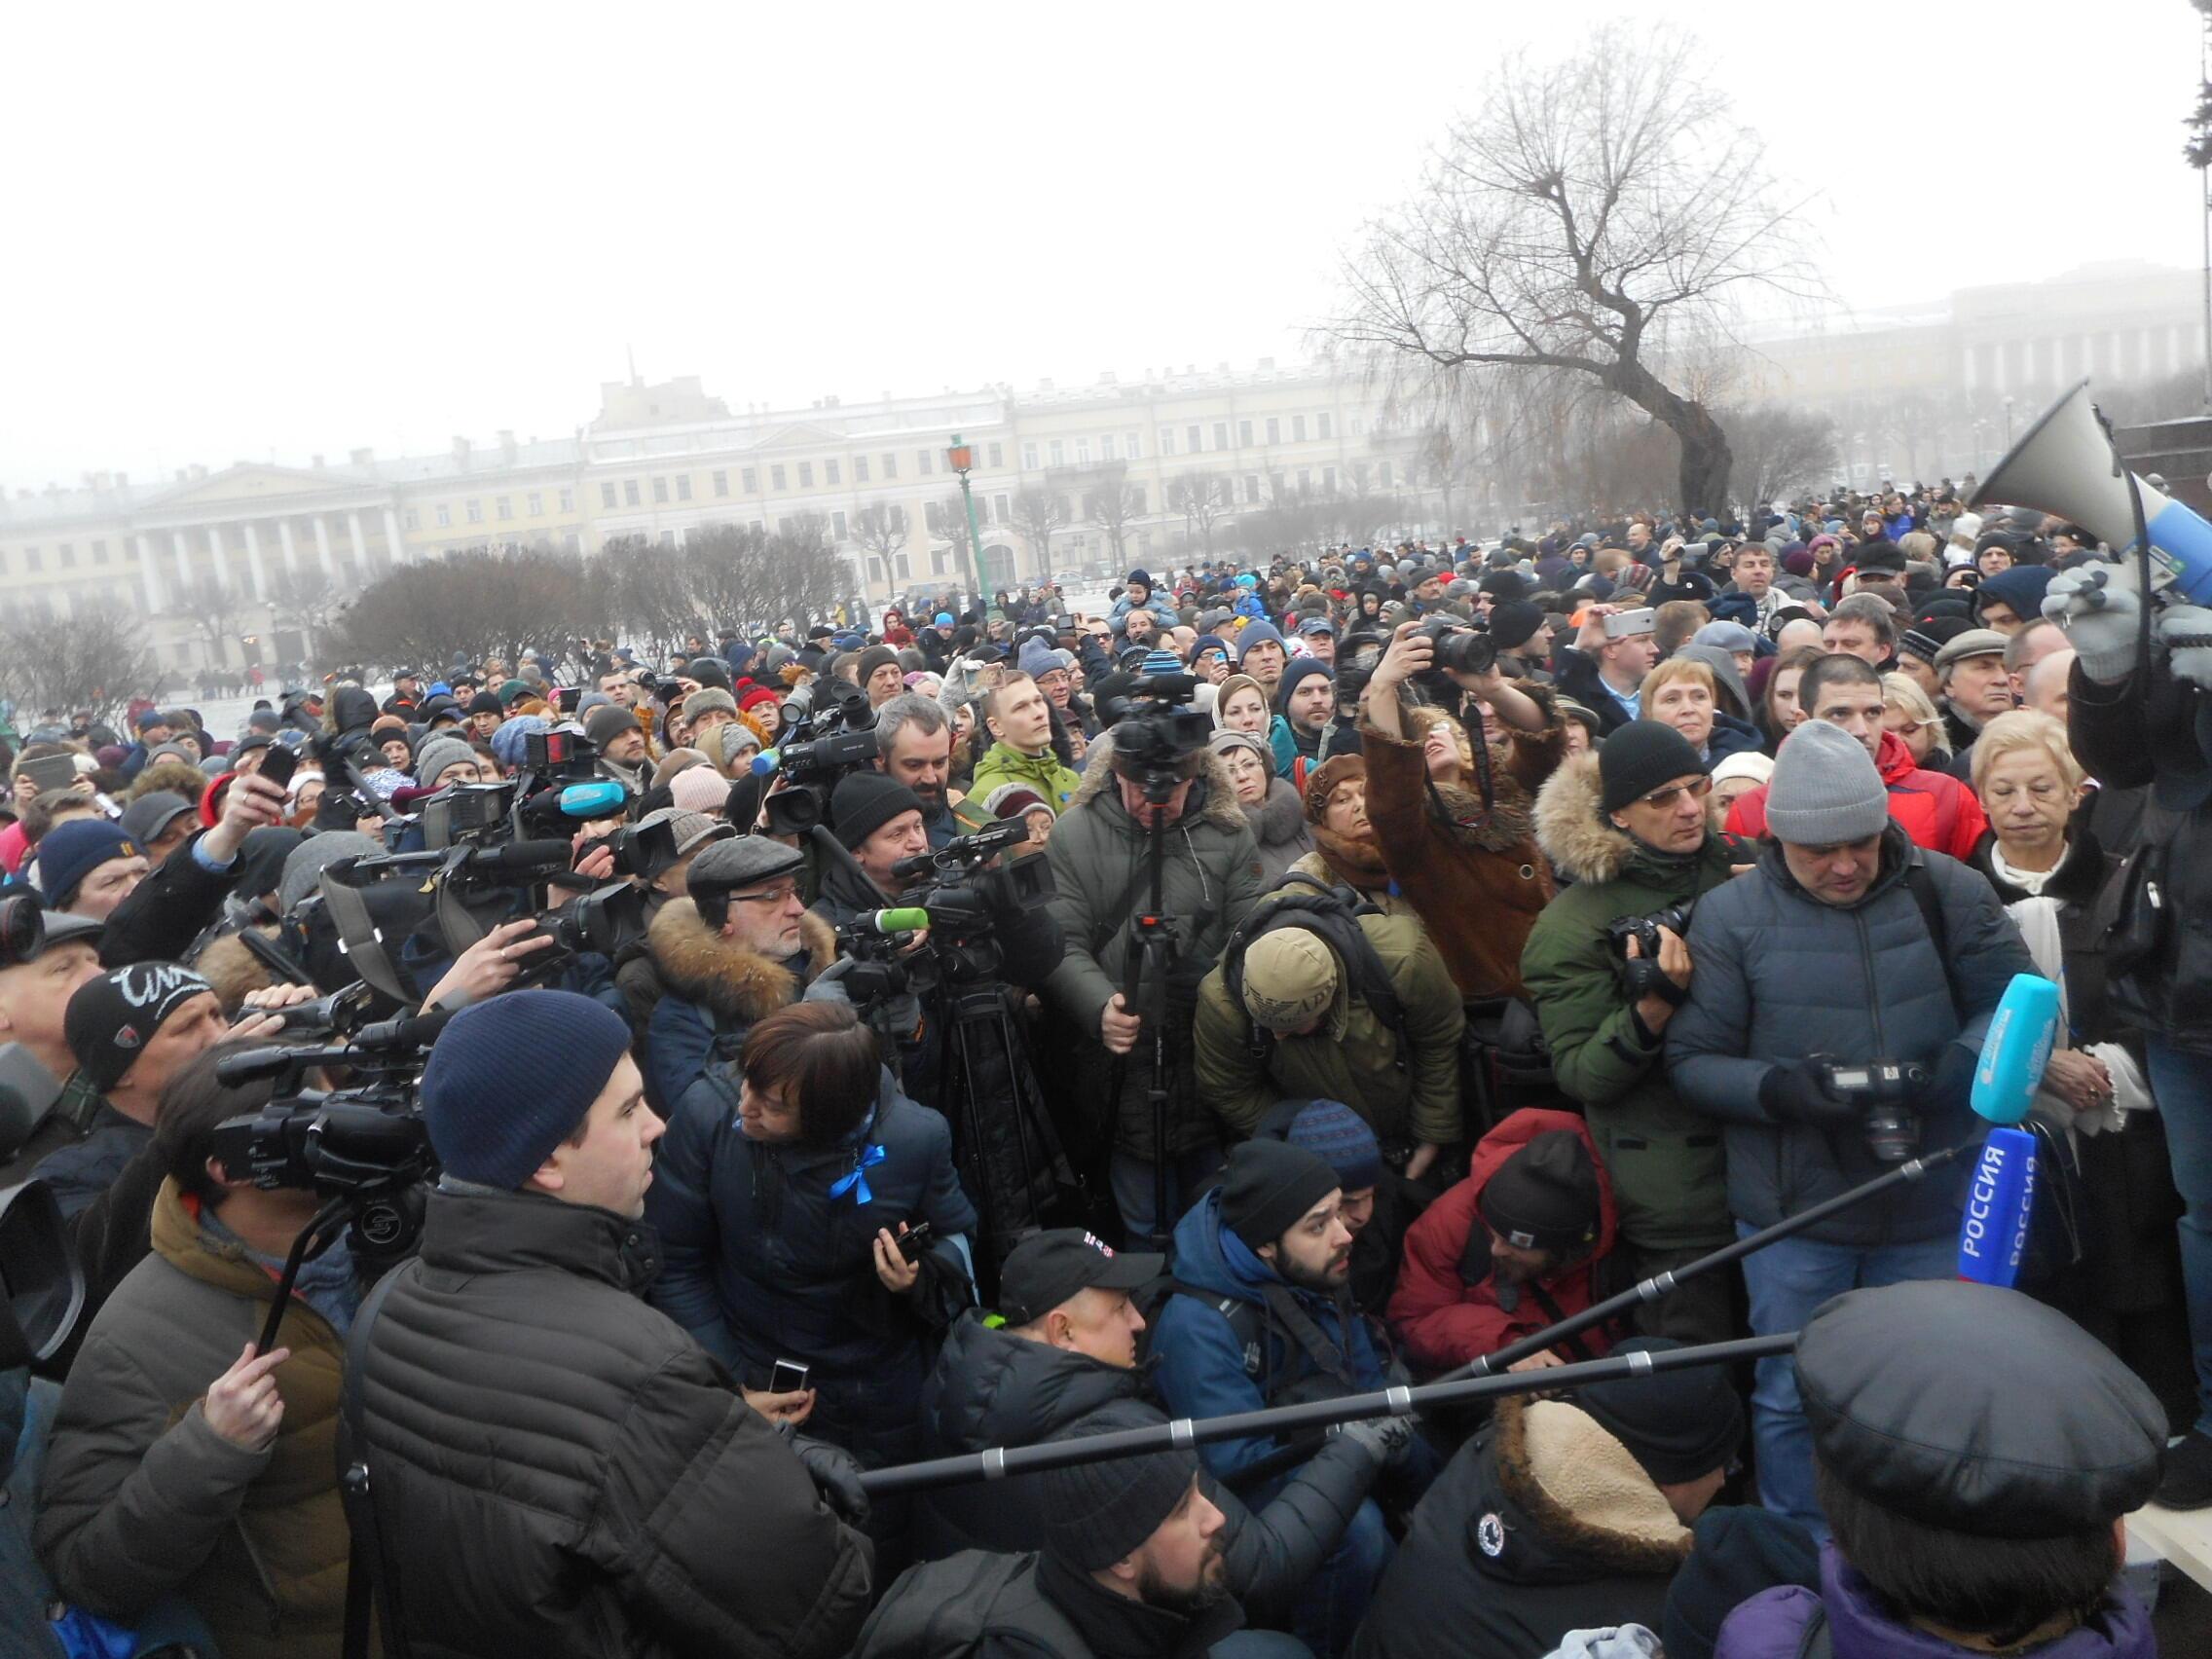 Митинг против передачи Исаакиевского собора РПЦ 28 января 2017